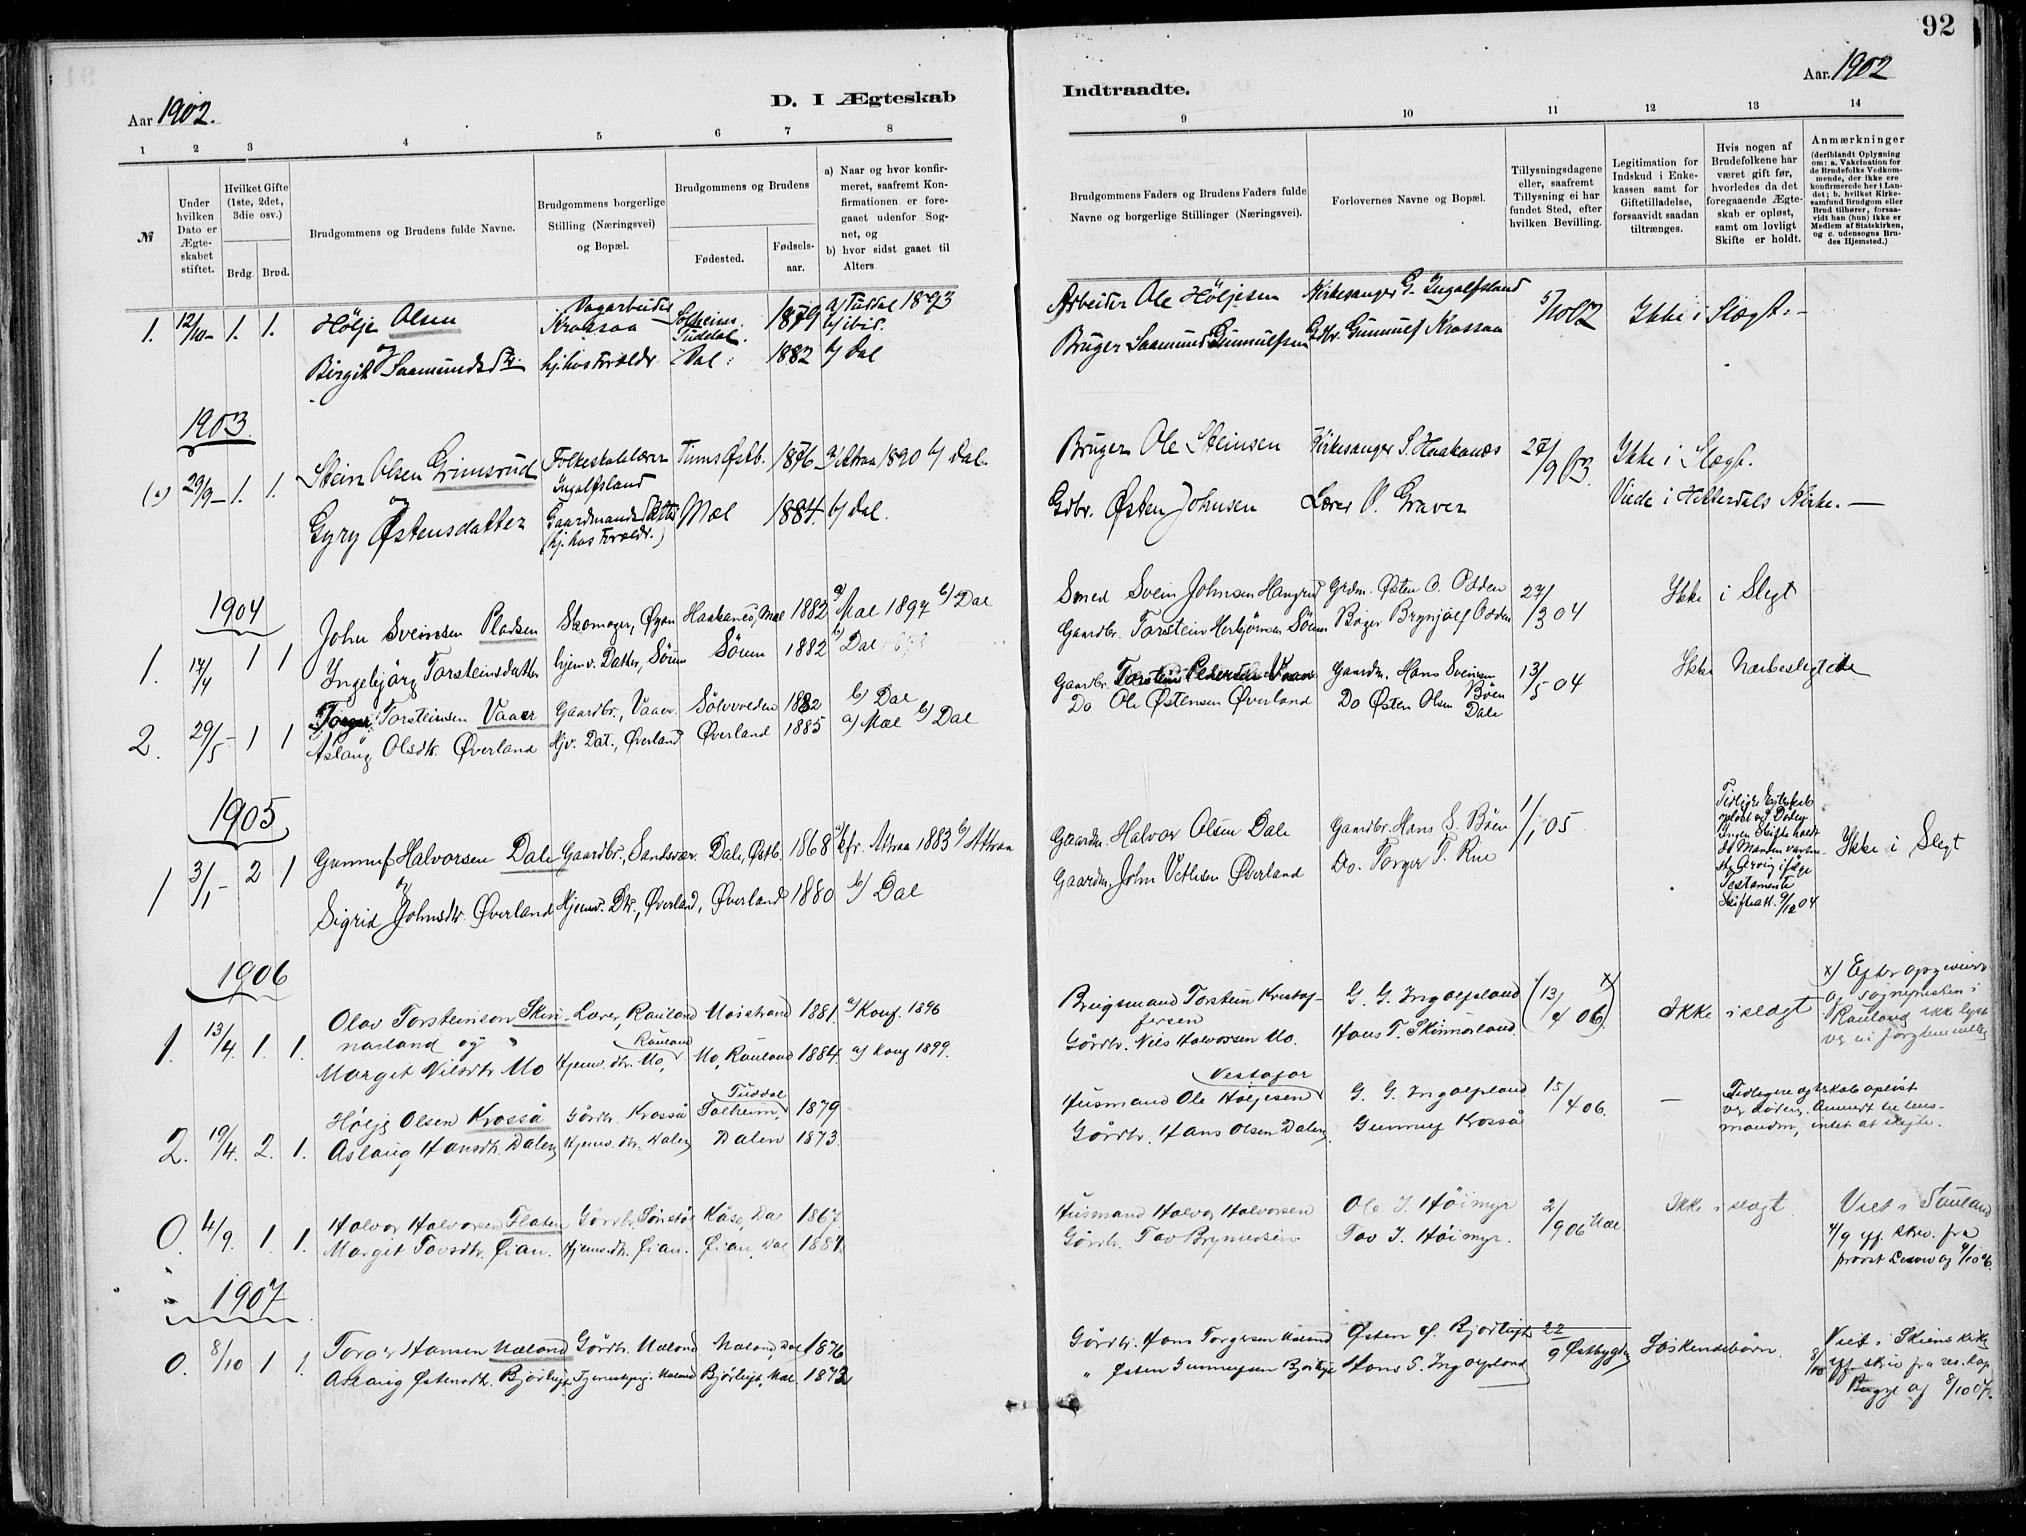 SAKO, Rjukan kirkebøker, F/Fa/L0001: Ministerialbok nr. 1, 1878-1912, s. 92